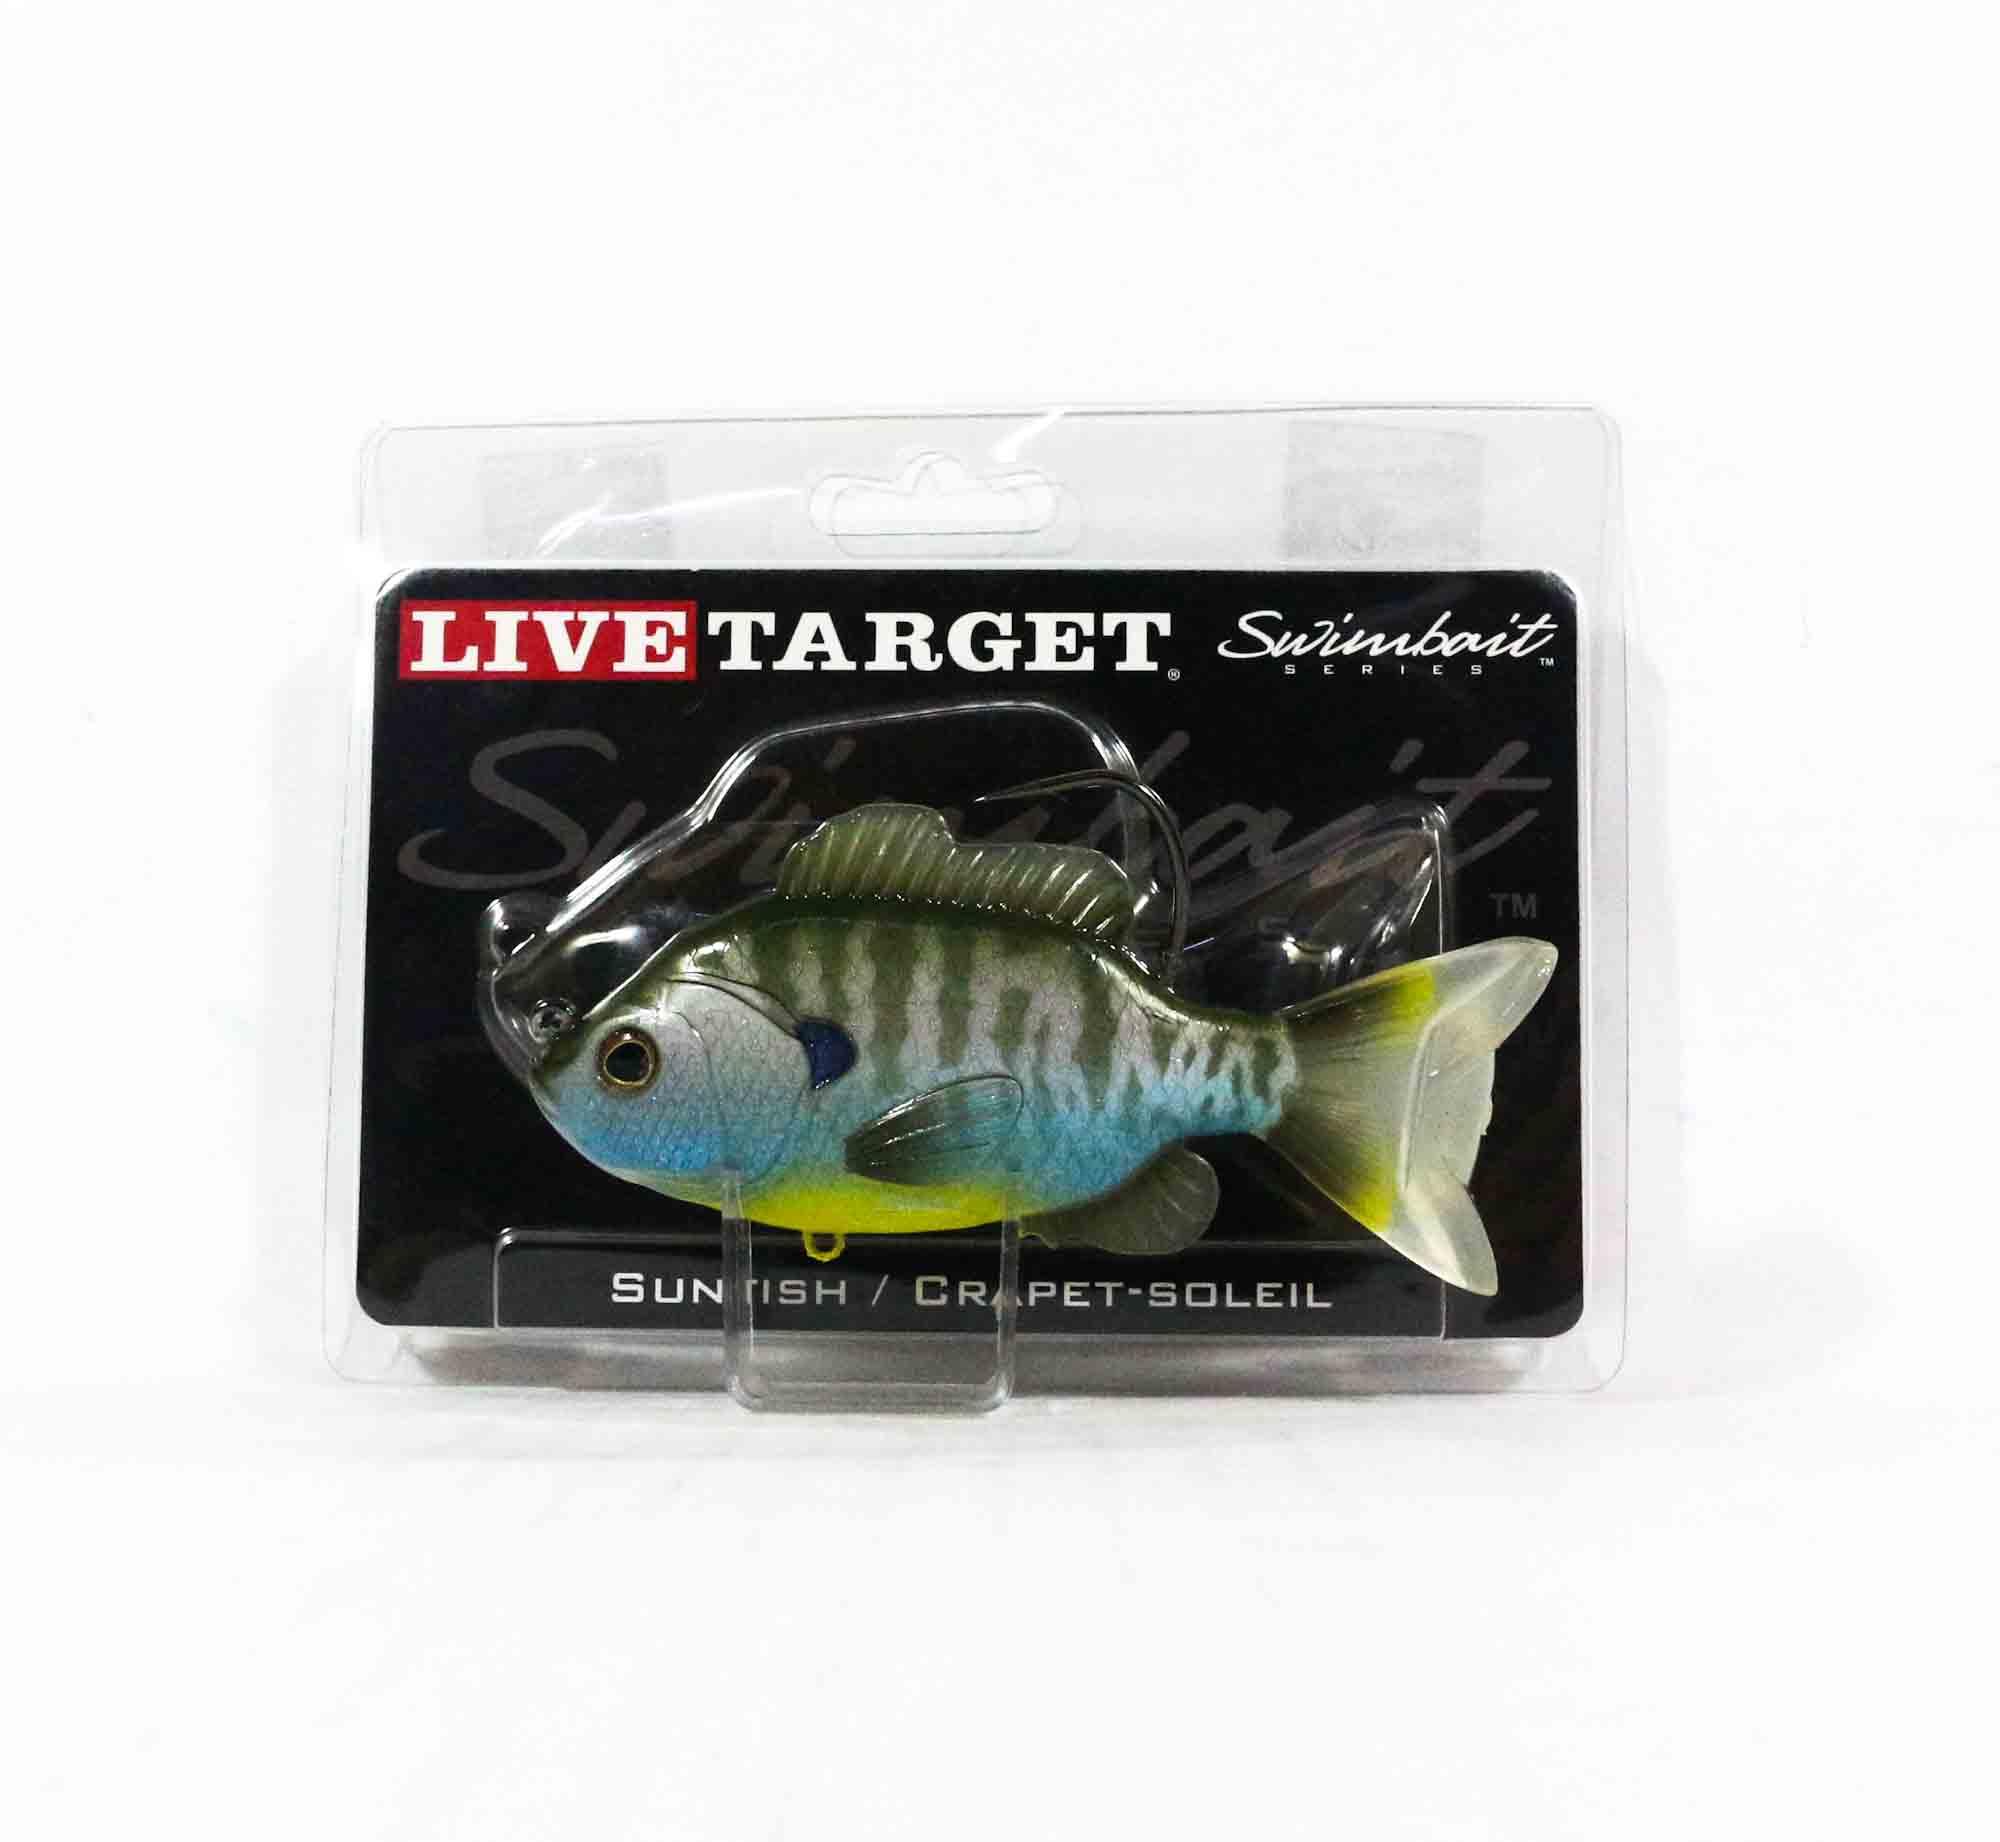 Live Target SFS110MS563 Swimbait Sunfish 4.3 Inch Natural Bluegill (0637)